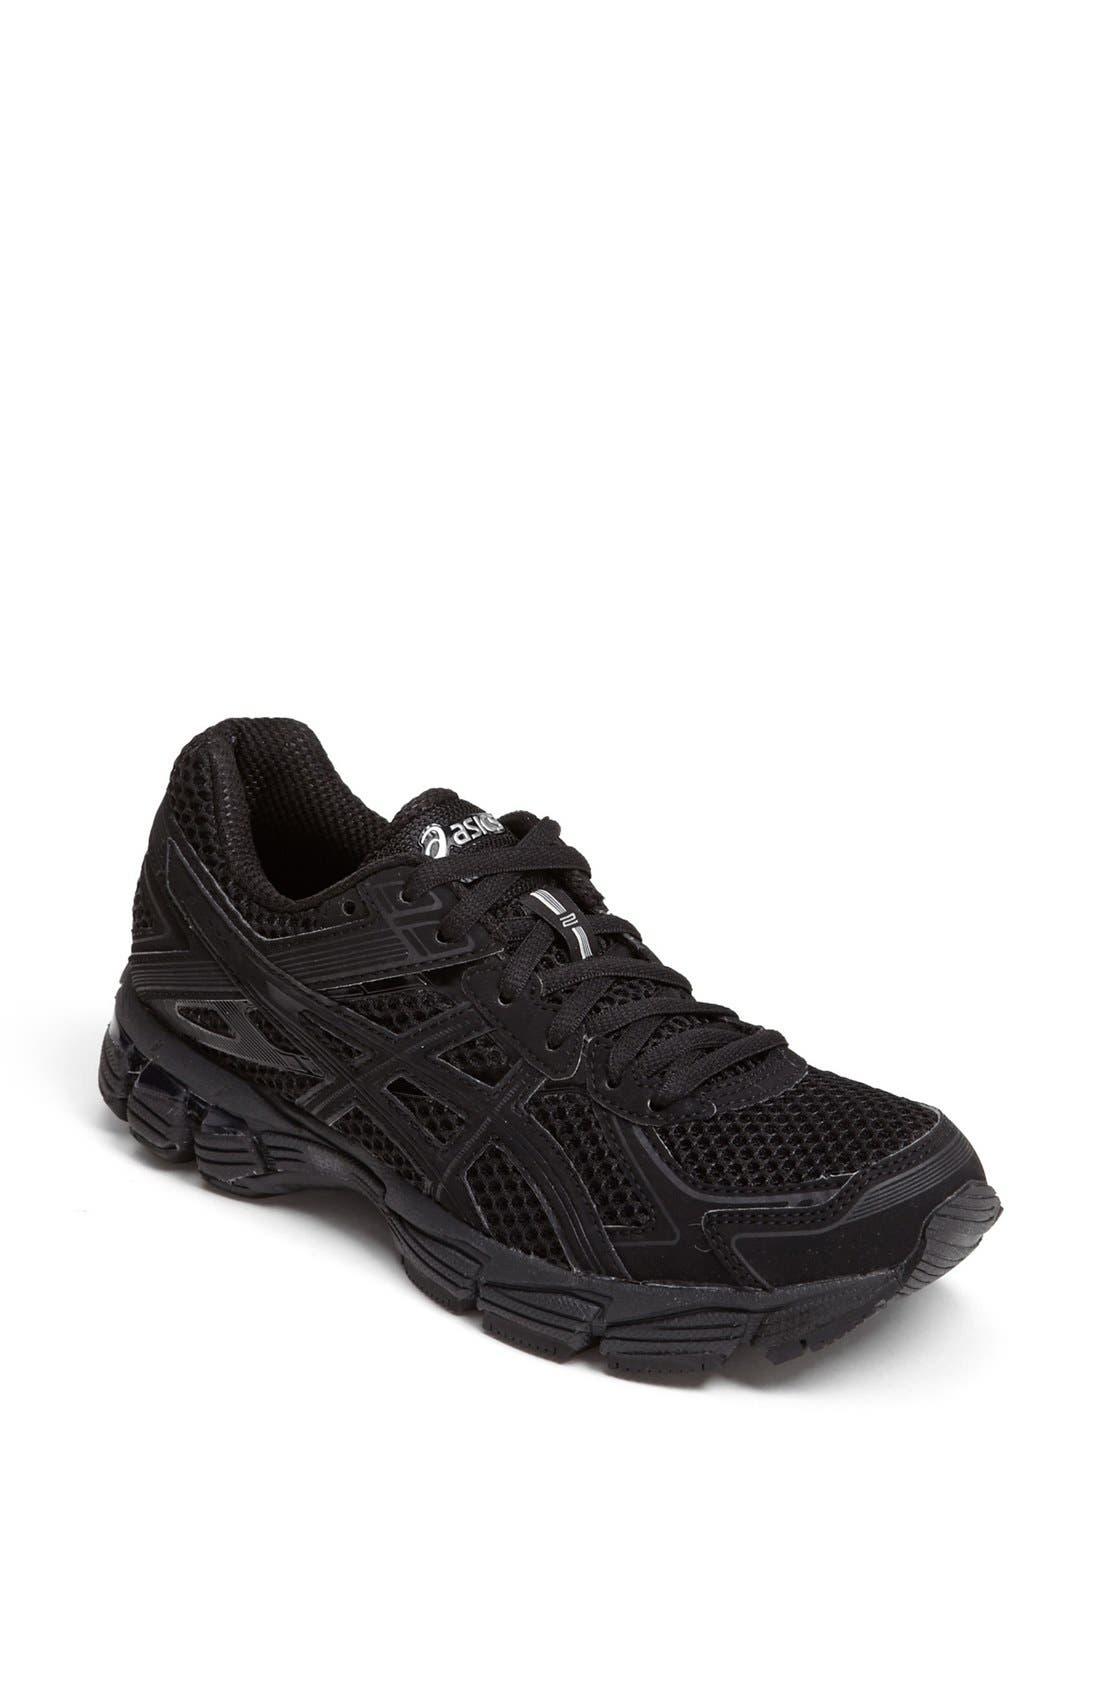 Main Image - ASICS® 'GT-1000™ 2' Running Shoe (Women)